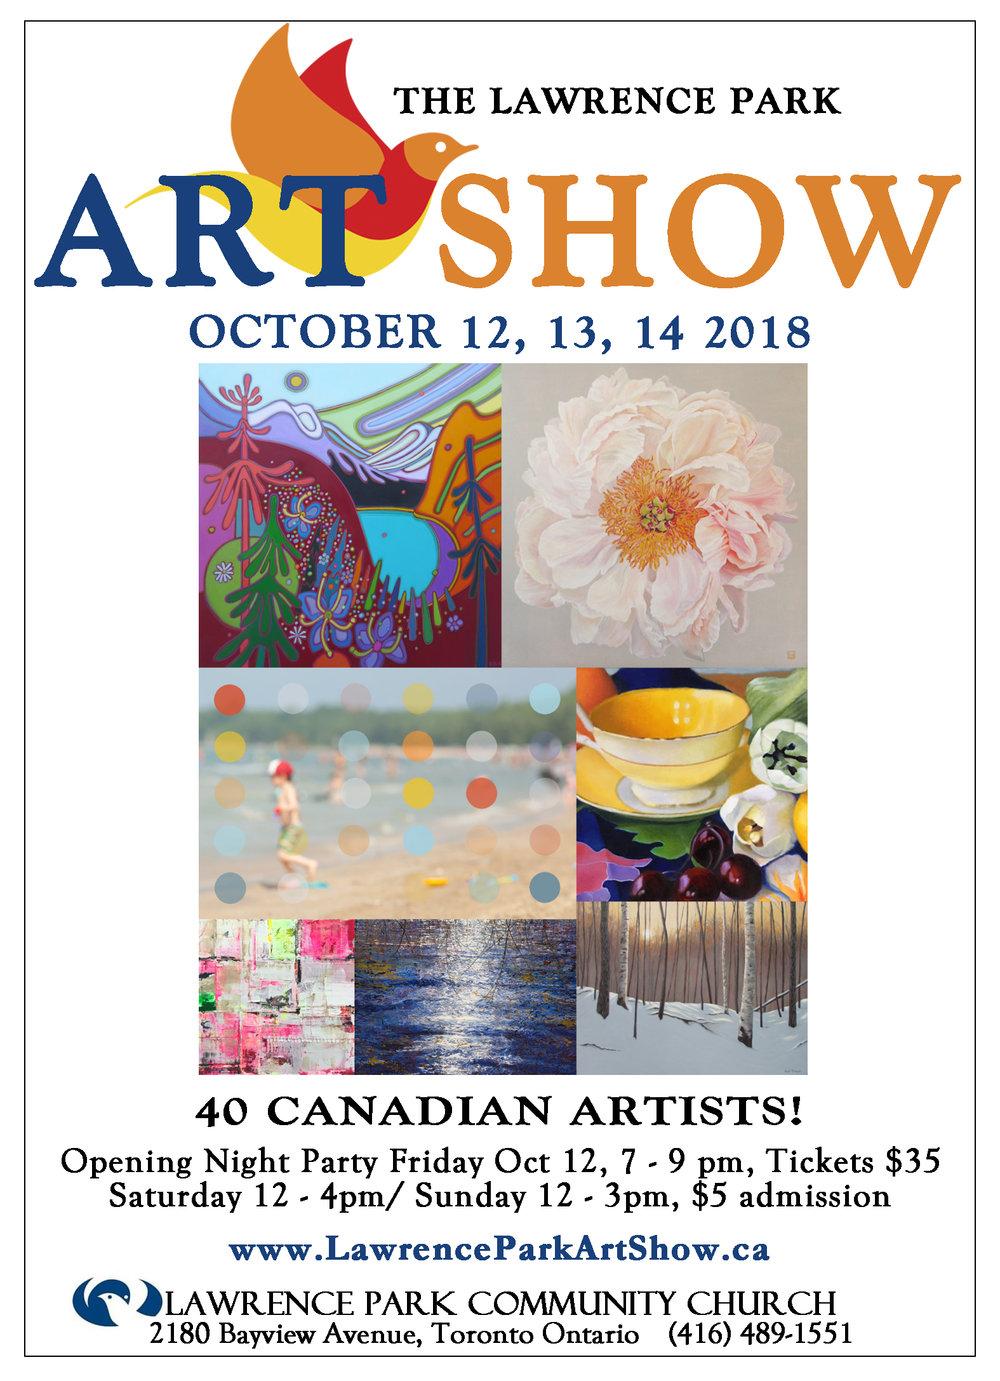 Art Show Postcard 2018final draft (2) (2) copy.jpg